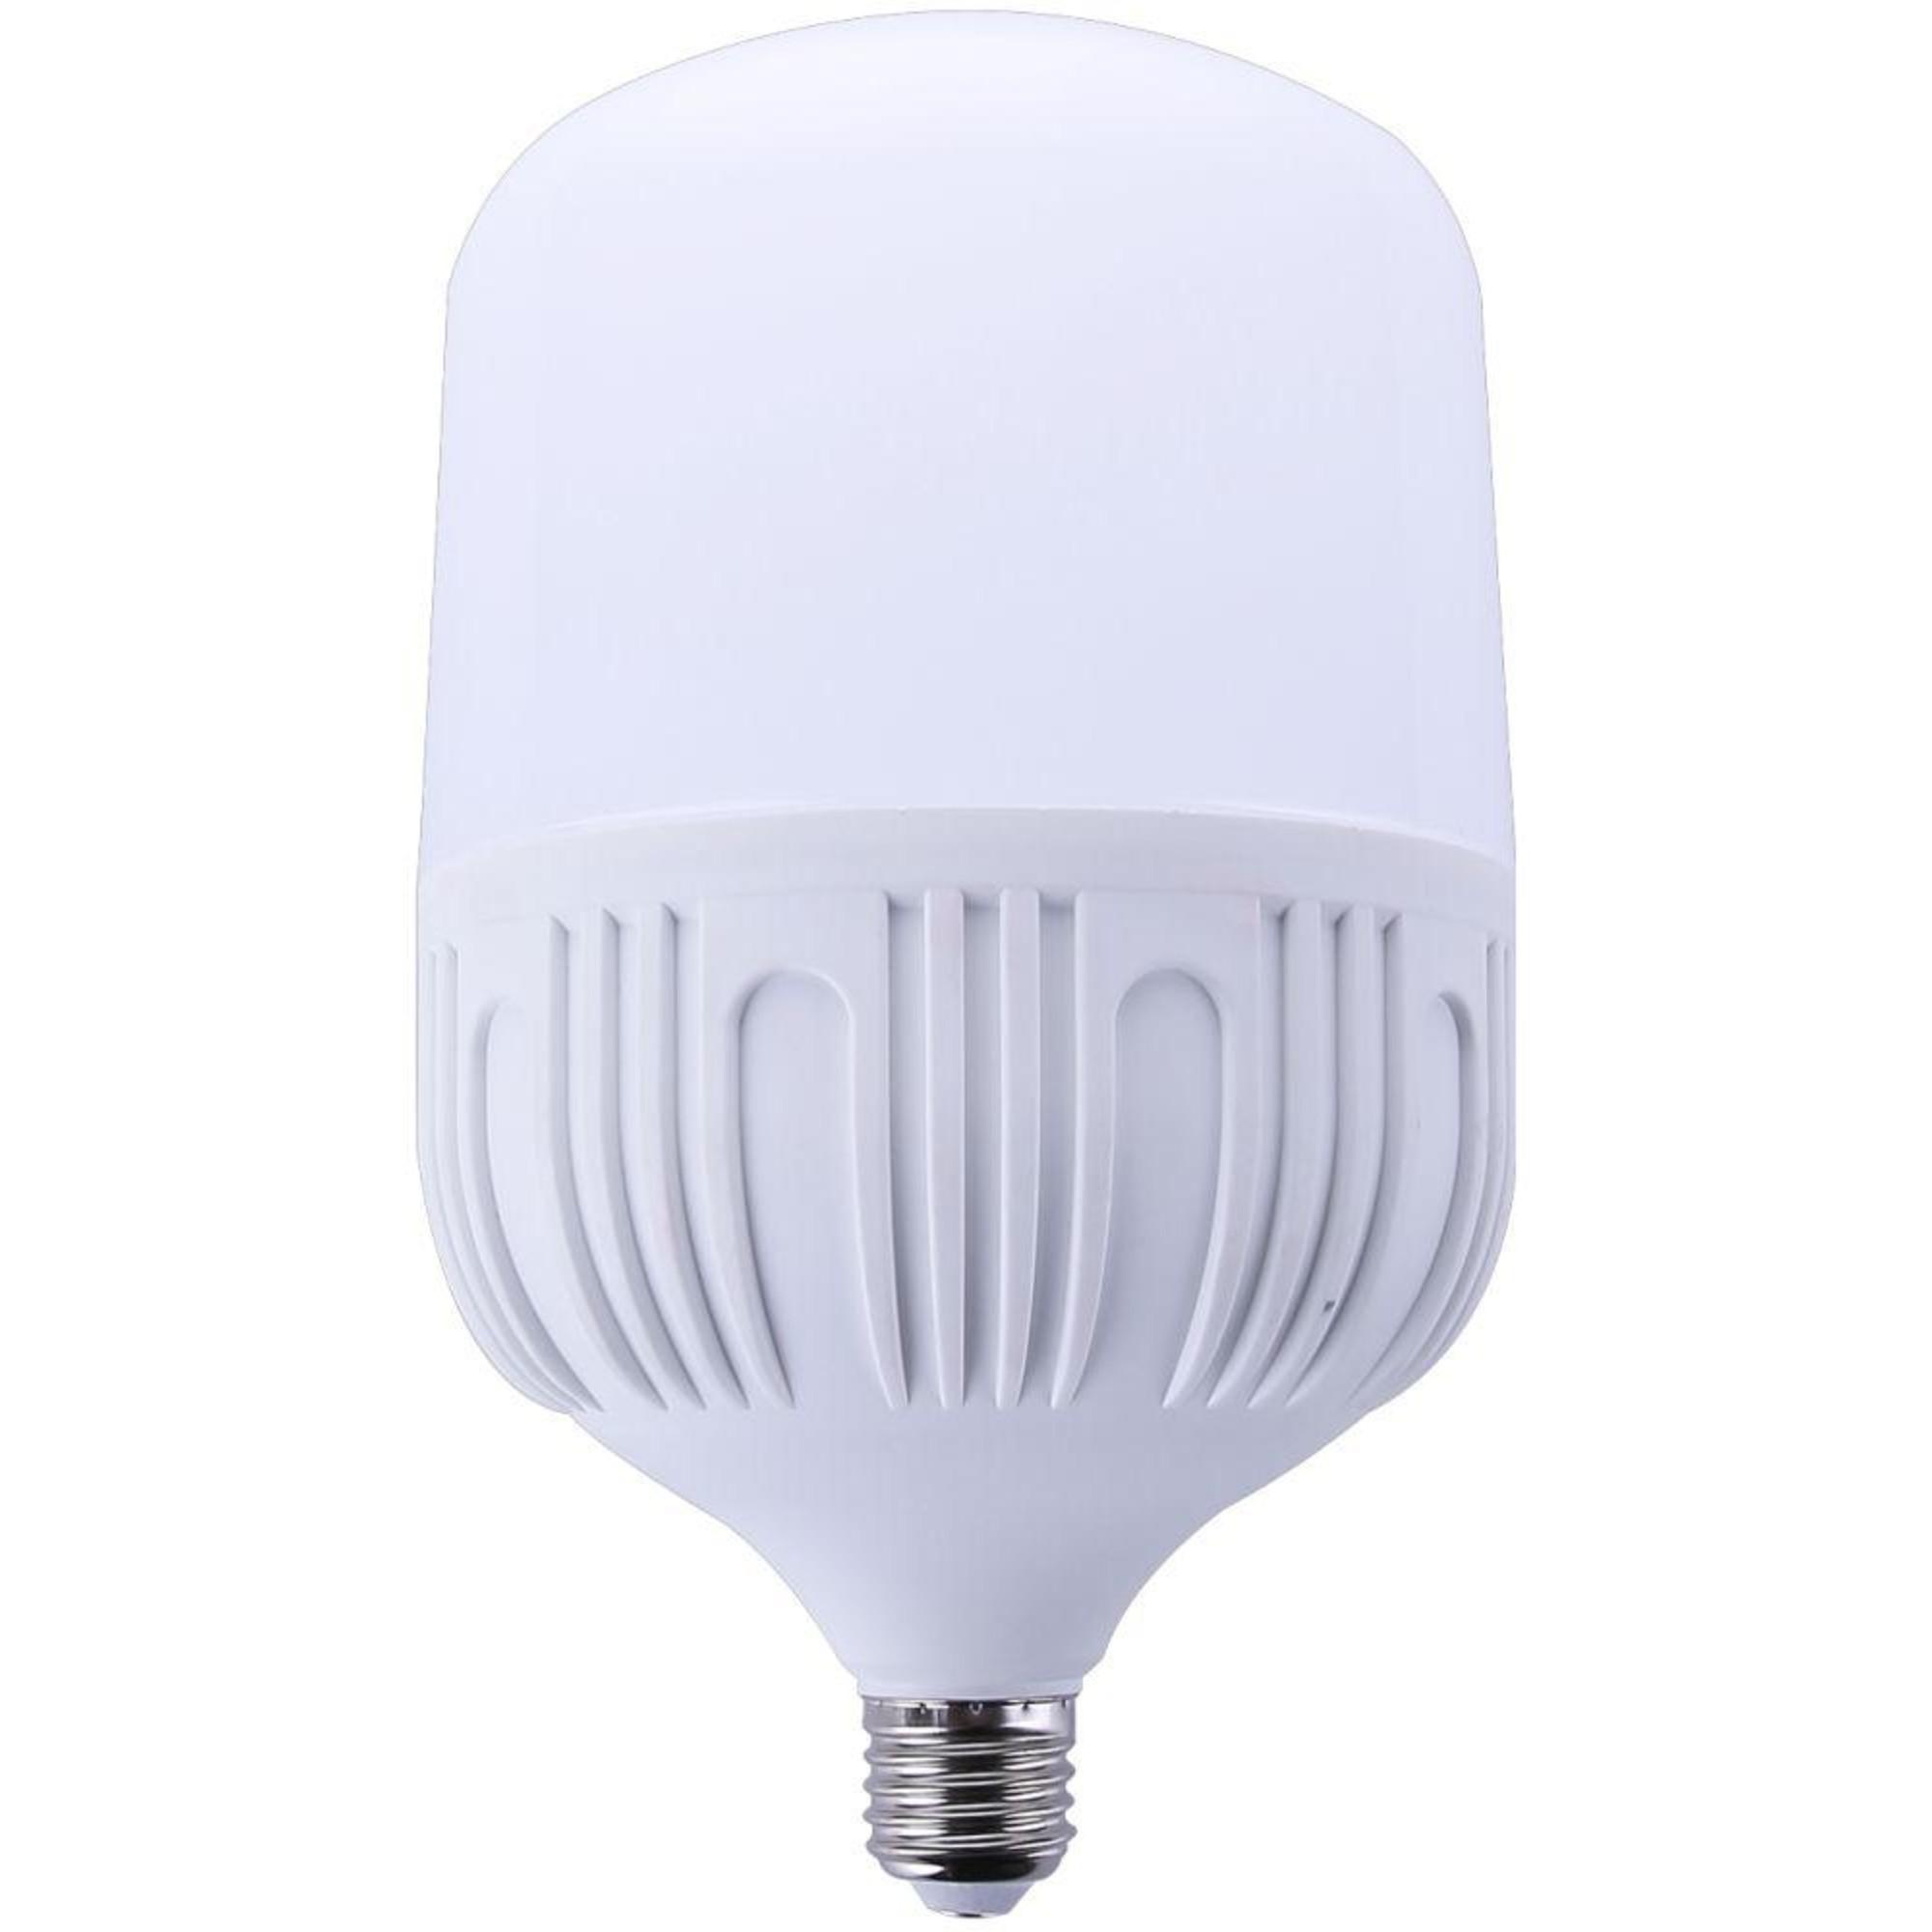 Лампа Ecola Premium светодионая E27 40 Вт 3600 Лм теплый свет